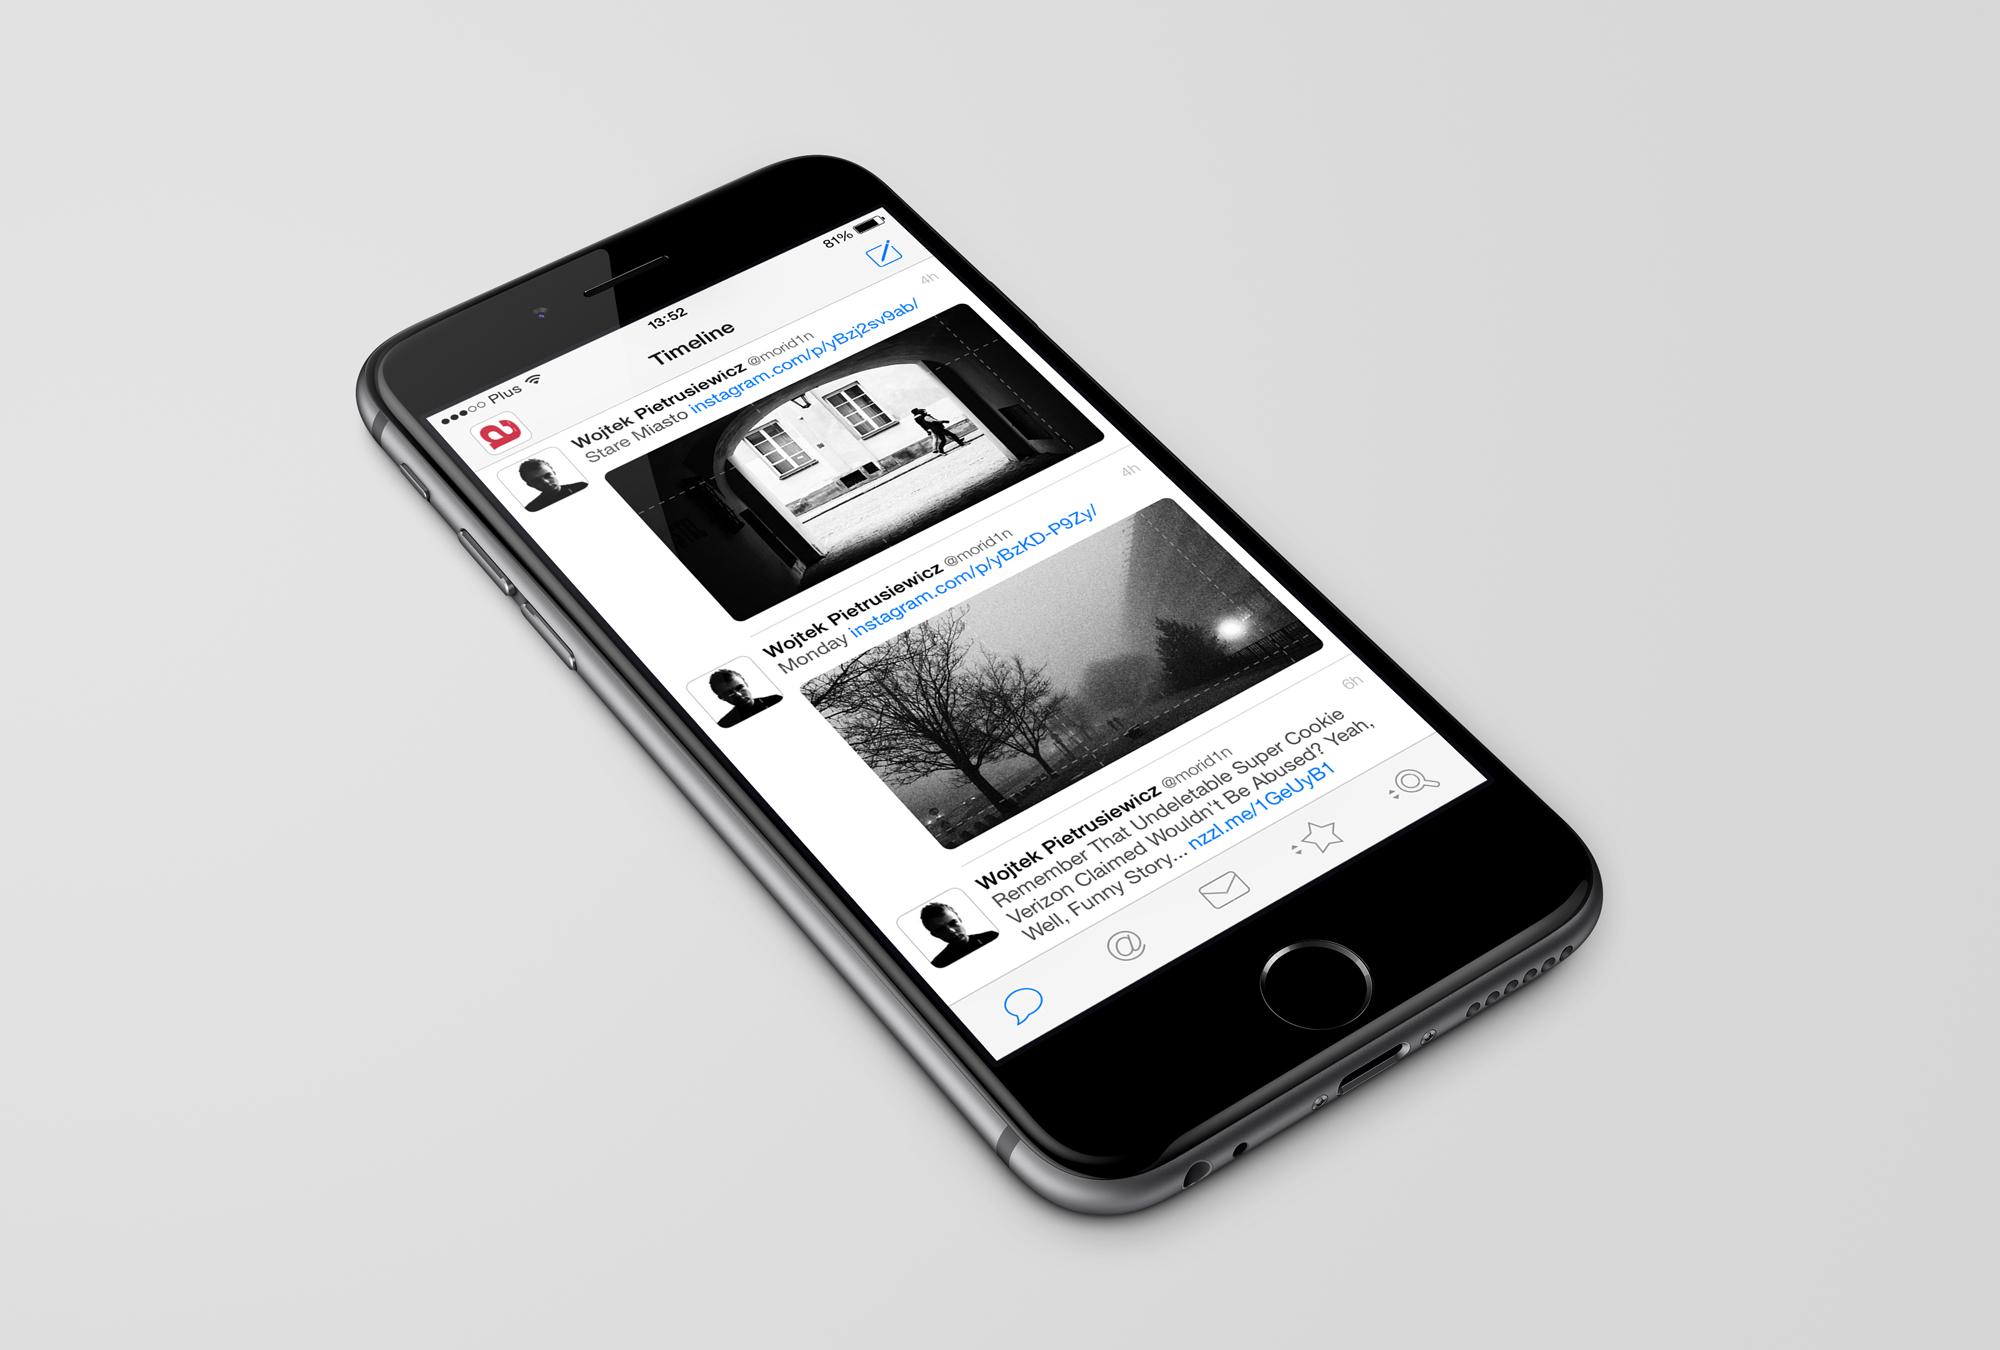 iPhone-6-Tweetbot-Twitter-hero-2000px